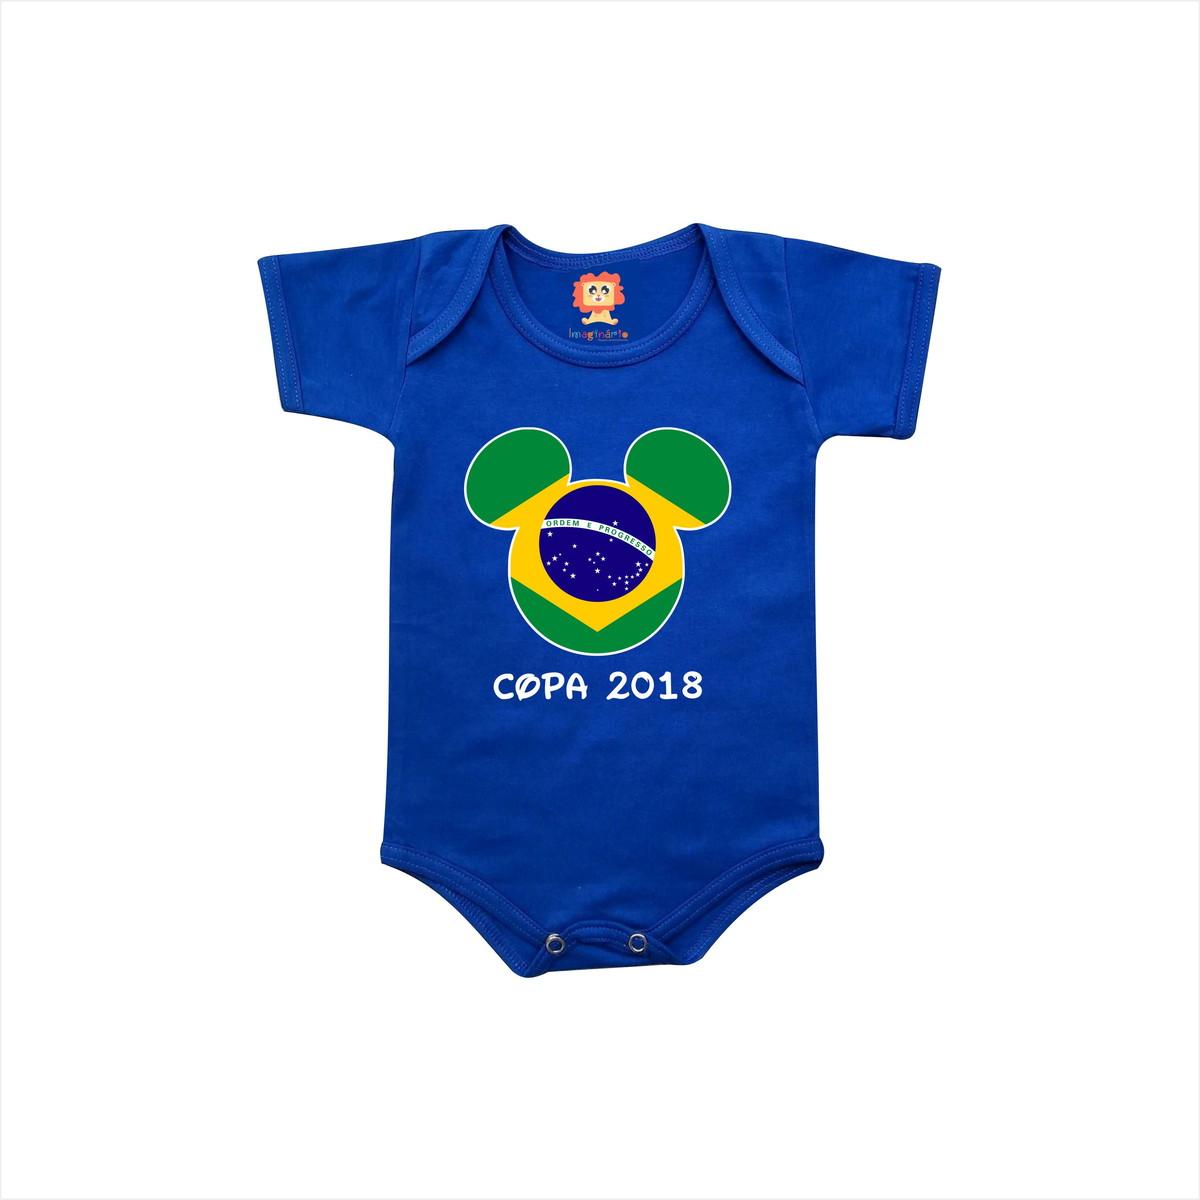 Body de Bebê ou Camiseta Brasil Mickey Copa do Mundo no Elo7 ... 96ca8ecbf10f4